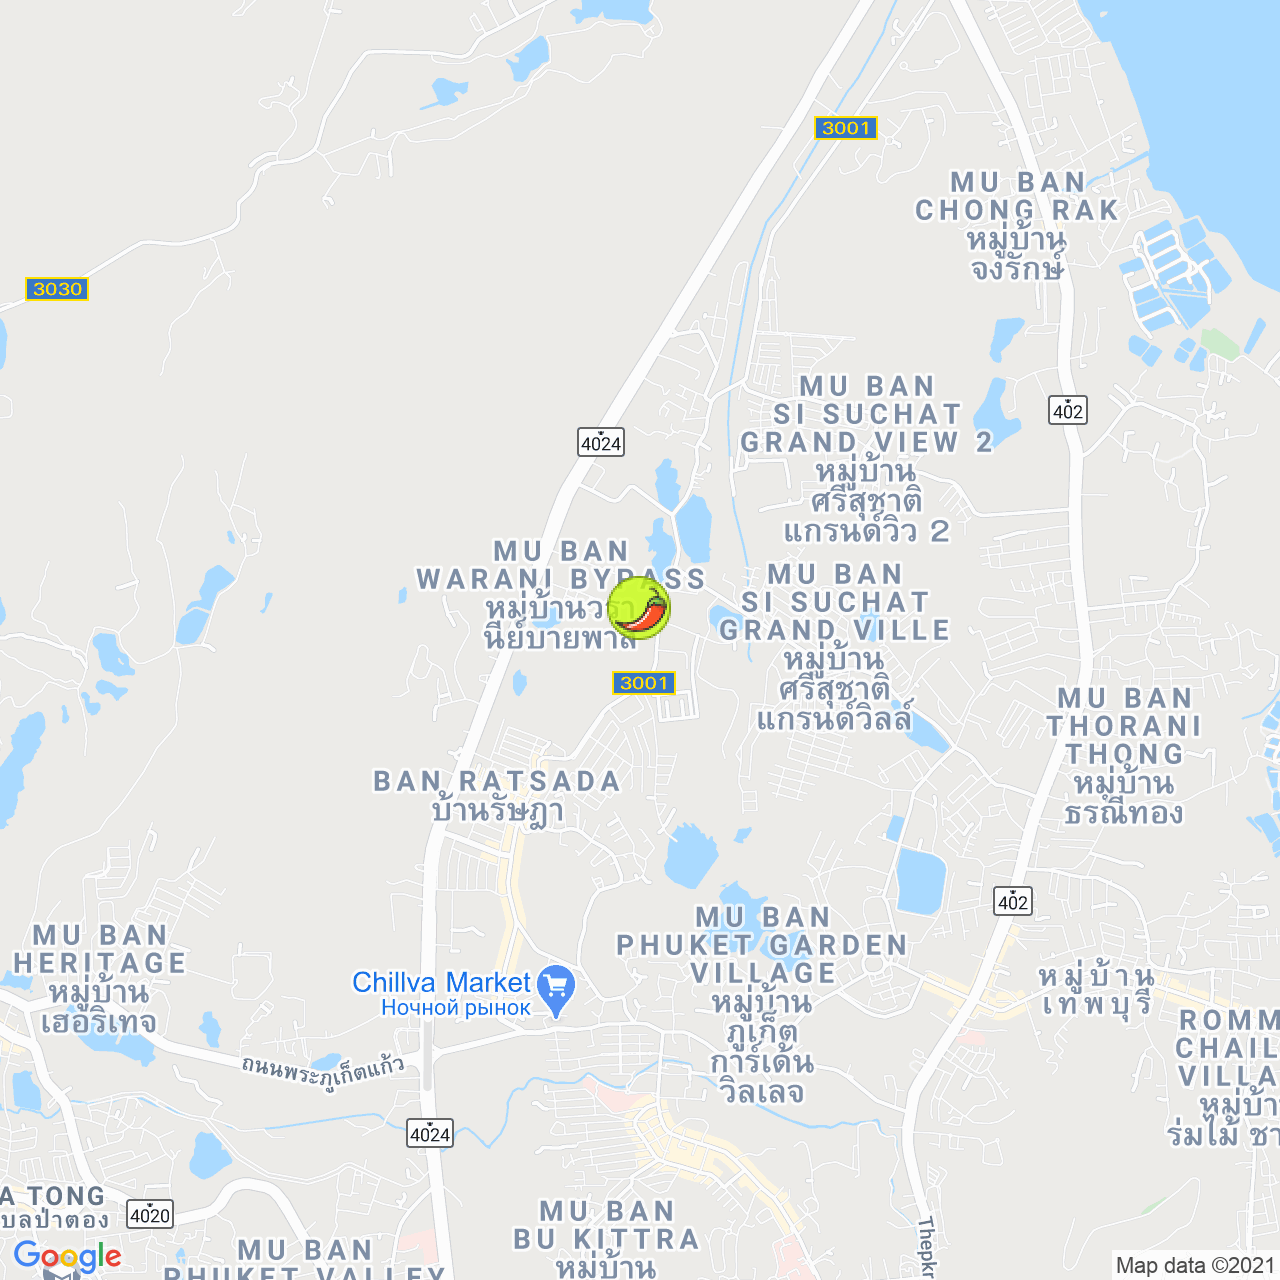 ⛓ CHAIN CAFE - Кафе в тюремной тематике - на карте Пхукета